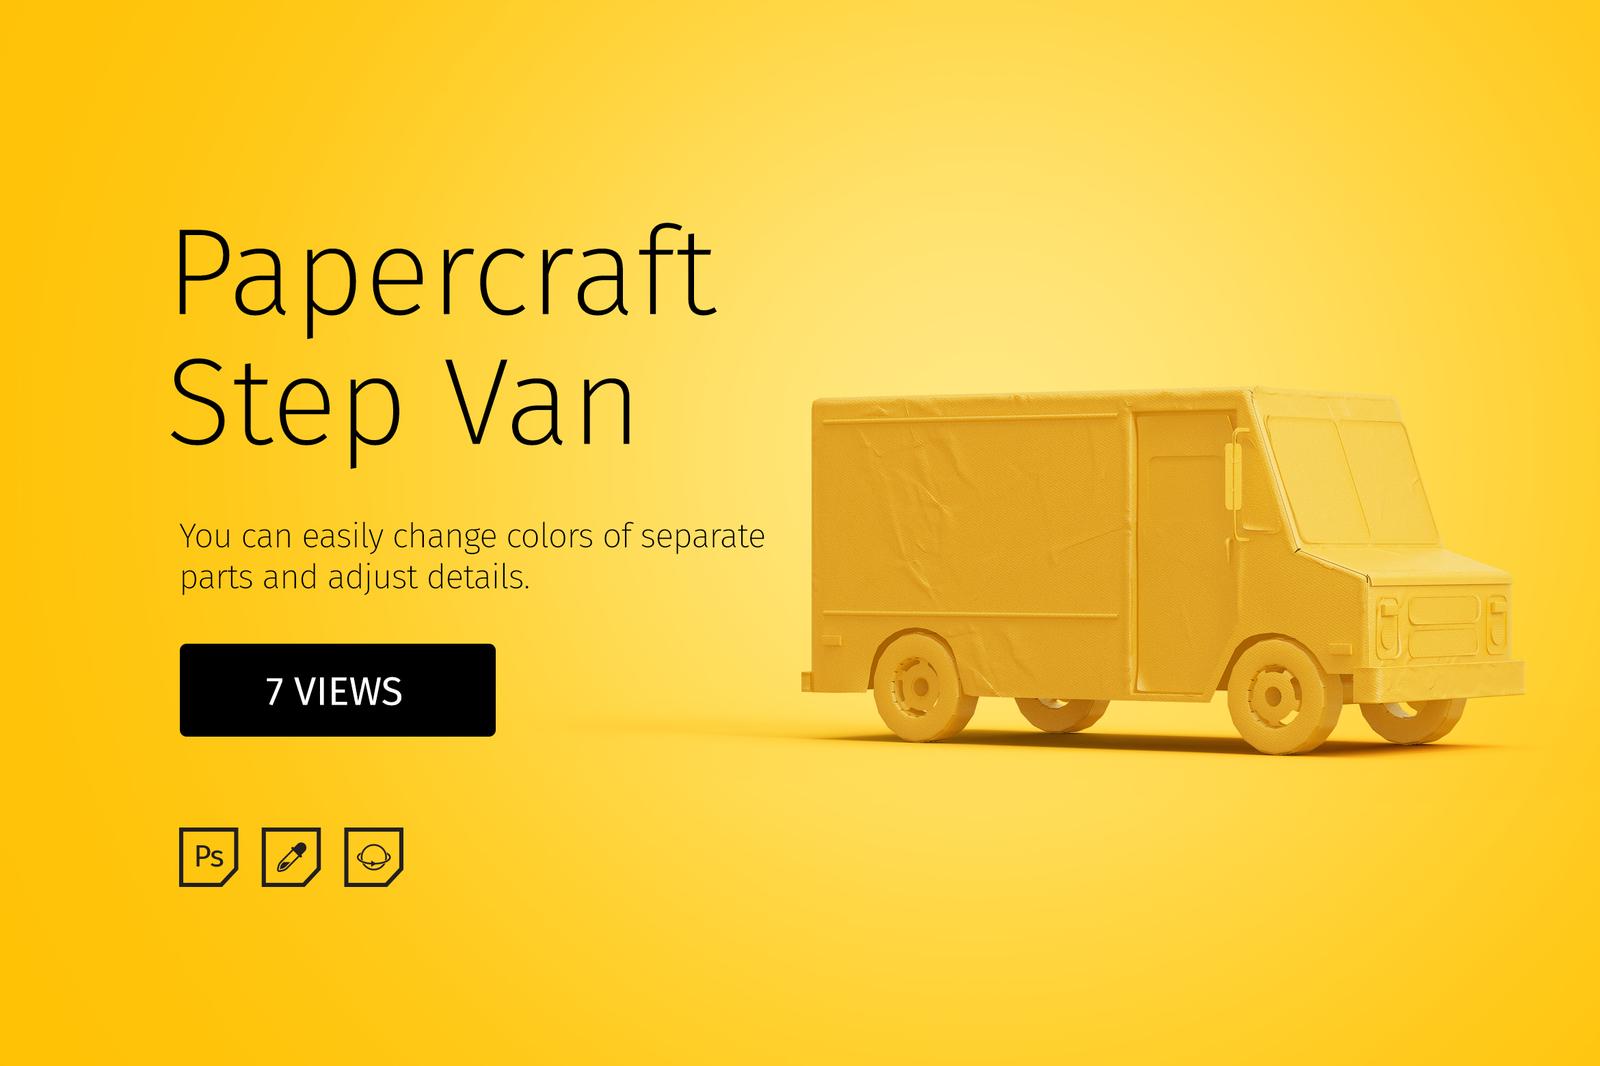 Papercraft Step Van